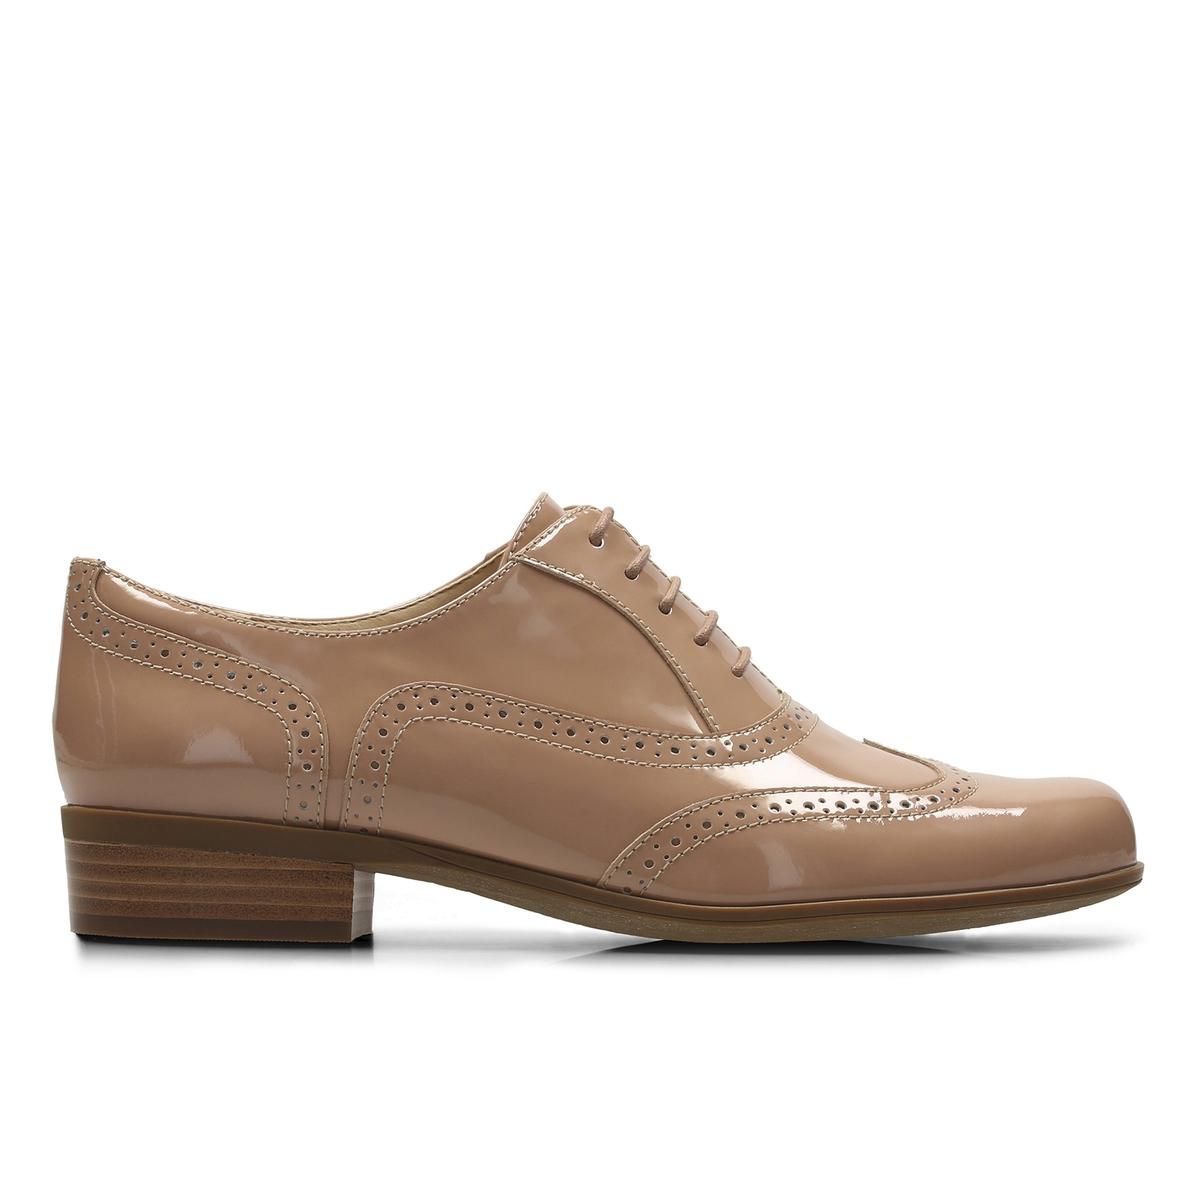 Ботинки-дерби из лакированной кожи  Hambloe Oak ботинки дерби clarks stafford park5 page 8